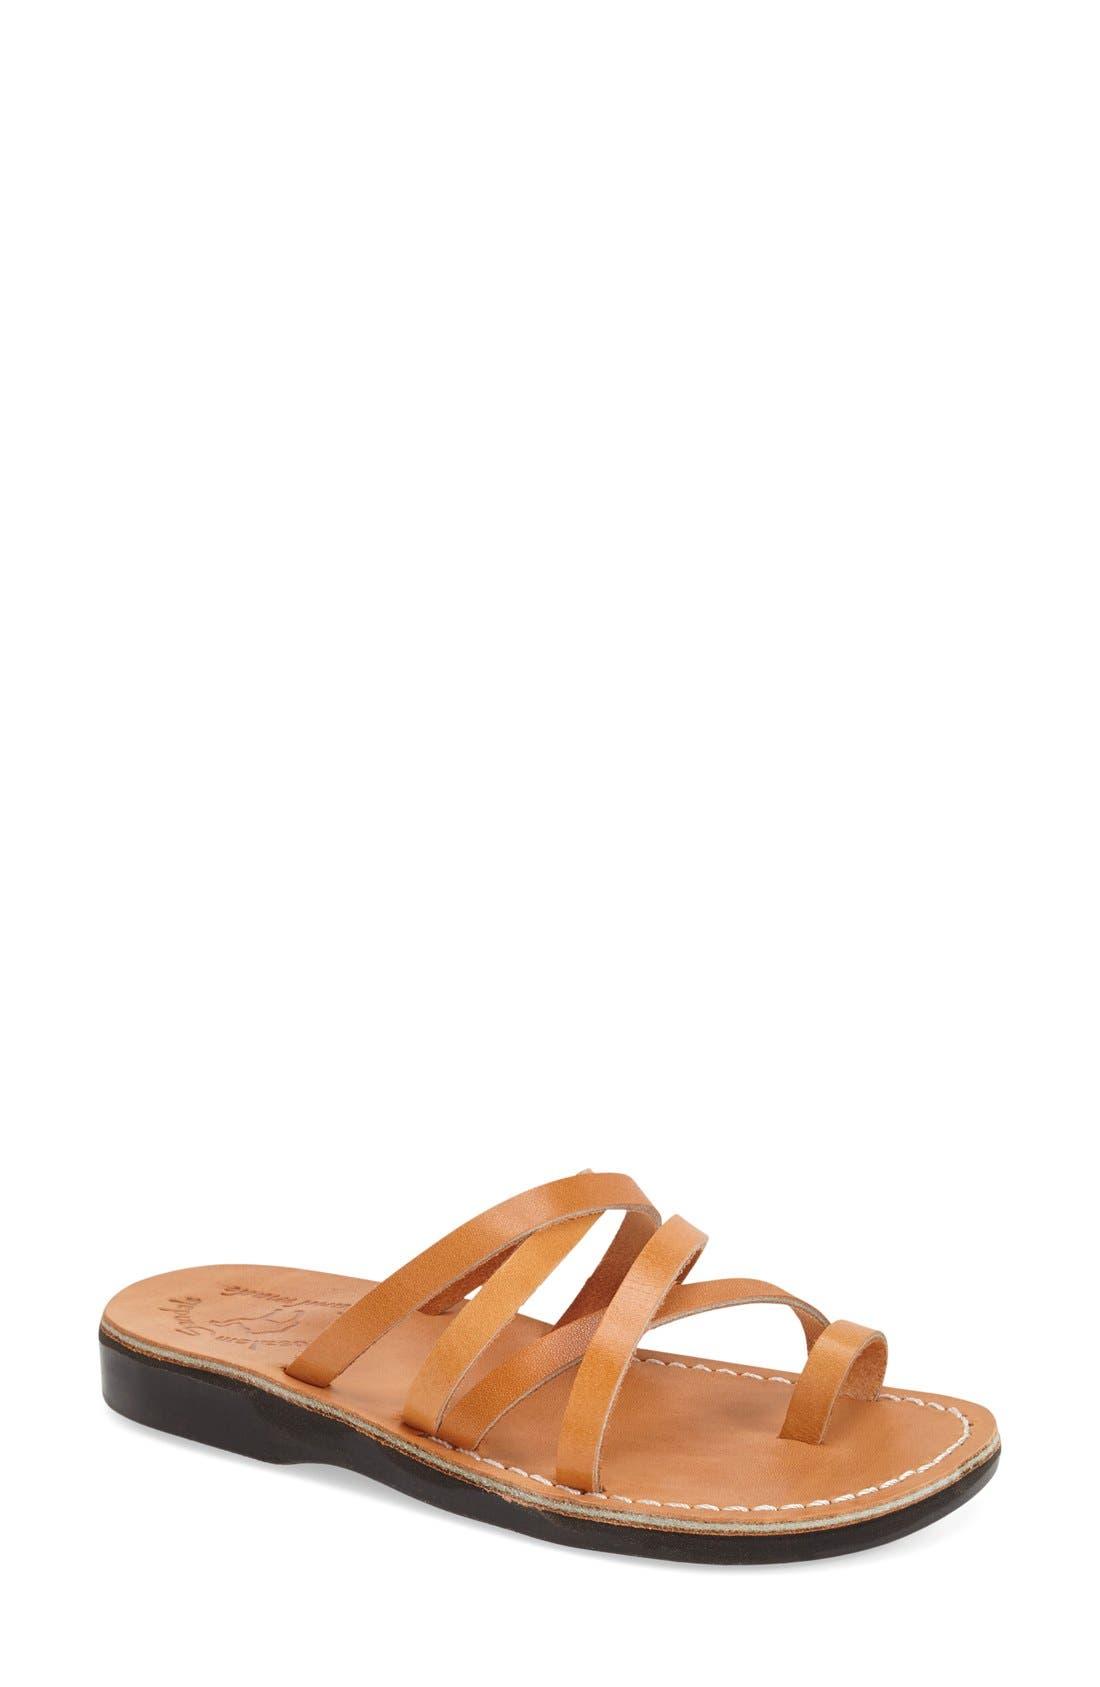 'Ariel' Strappy Slide Sandal,                         Main,                         color,